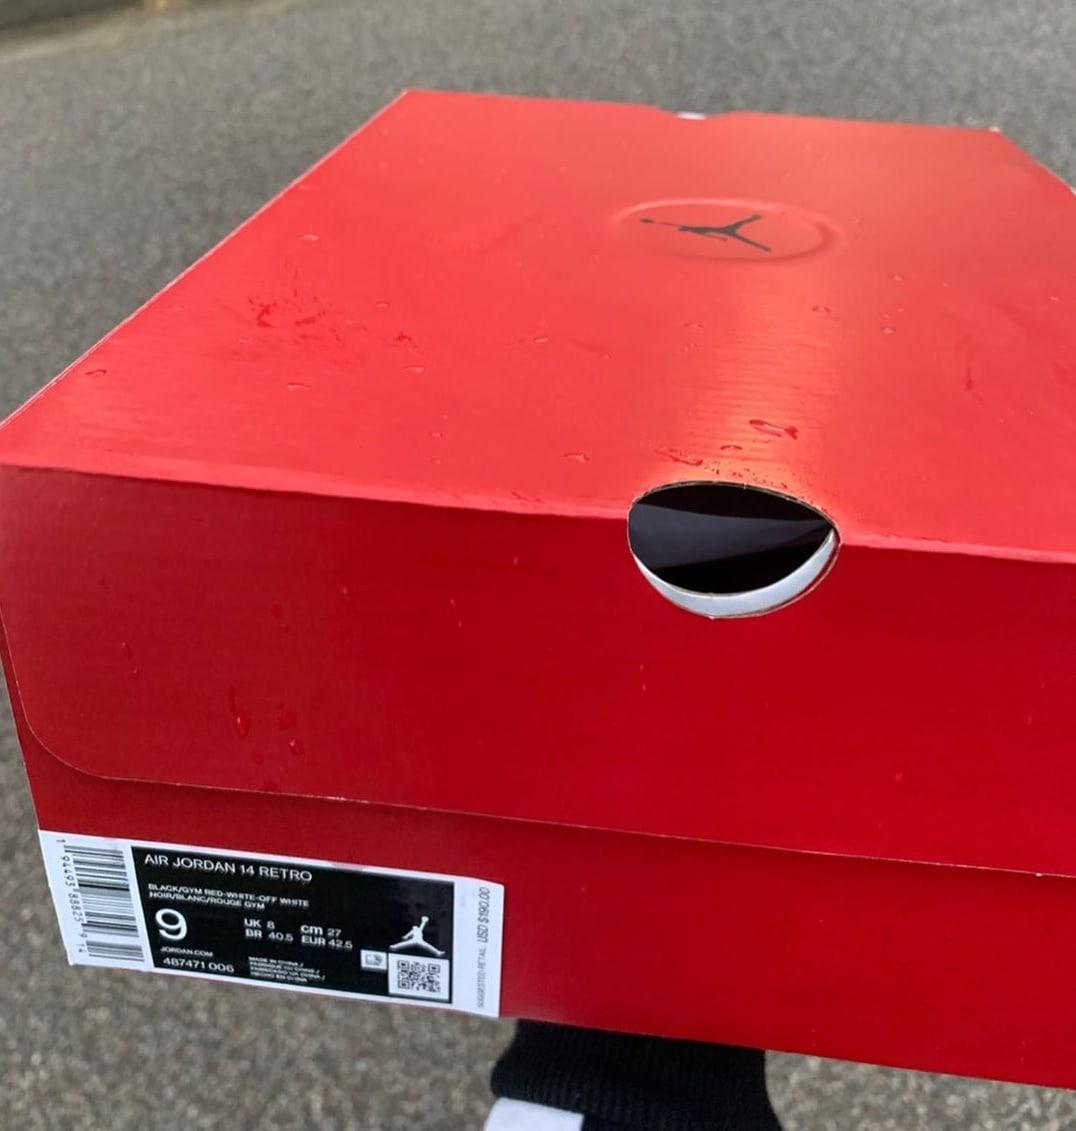 Air Jordan 14 Retro 'Gym Red' 487471-006 Box